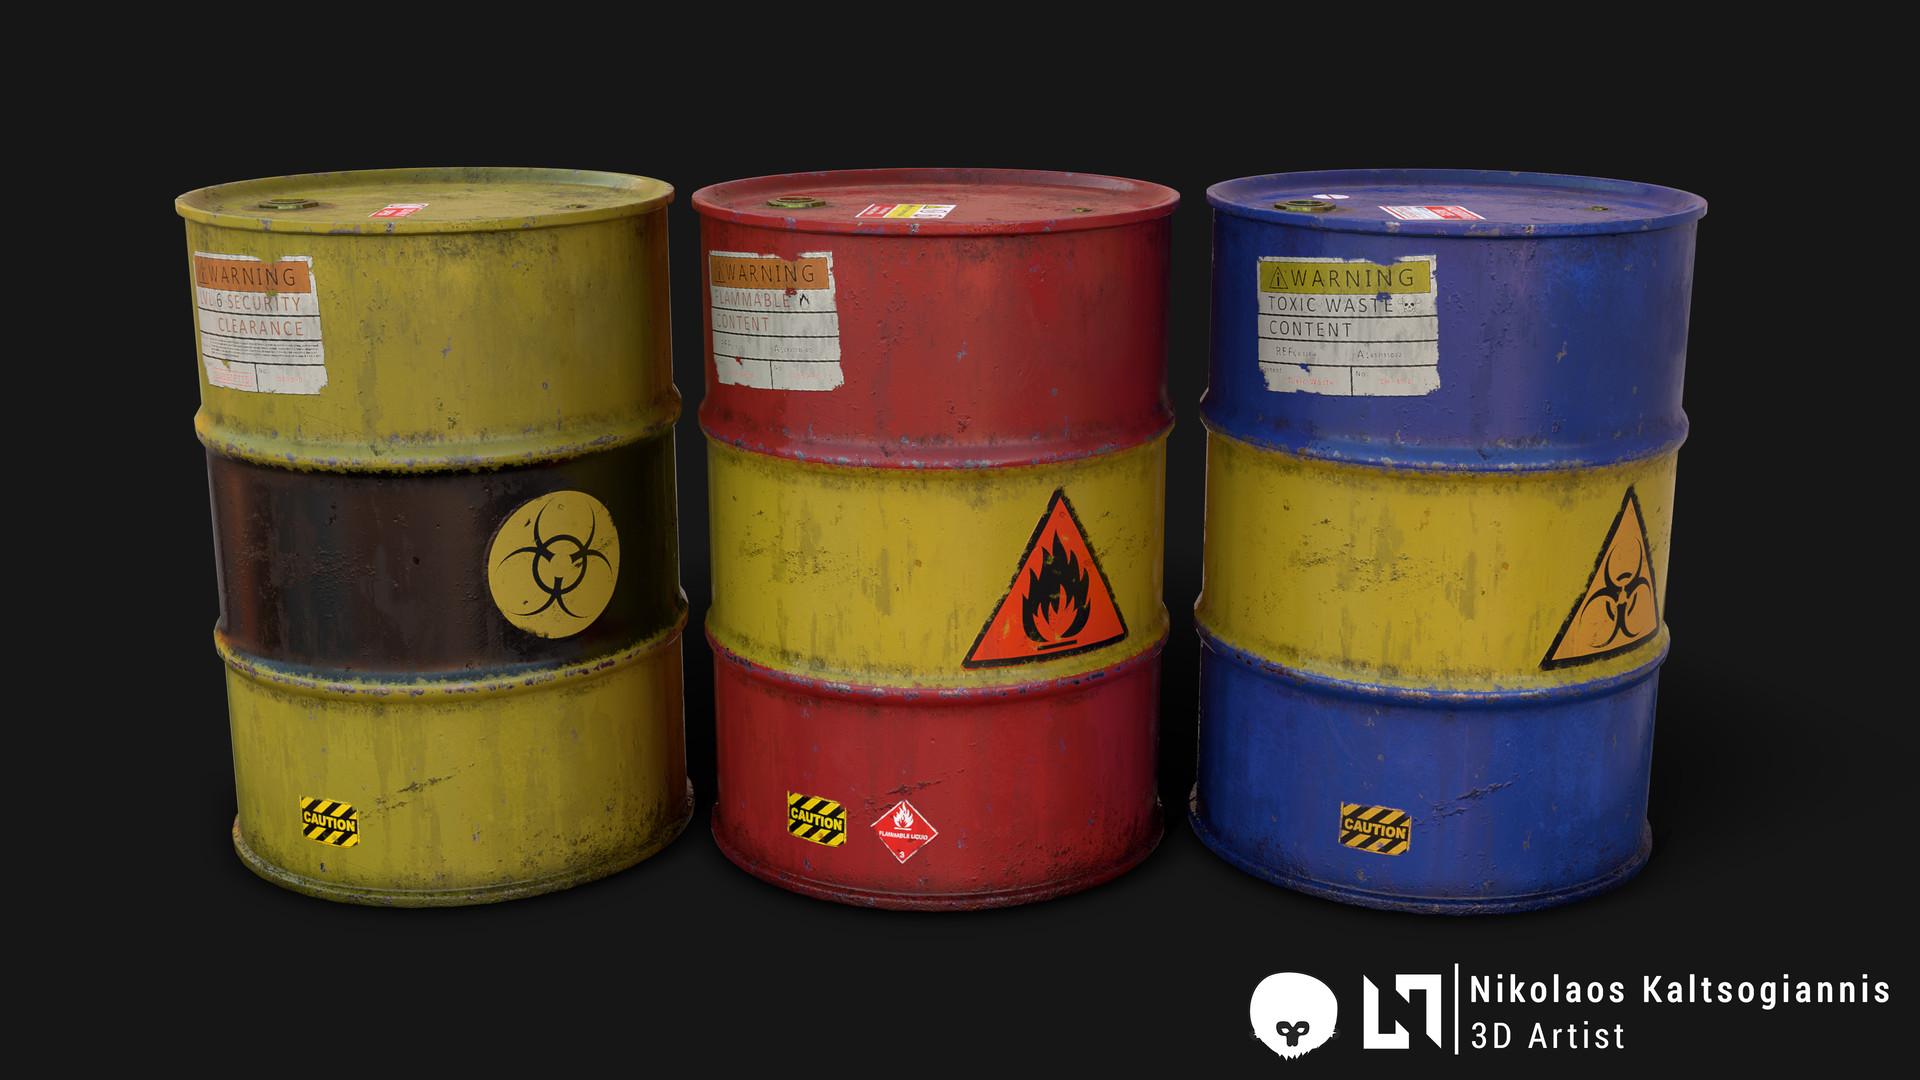 Nikolaos kaltsogiannis steel barrel 03